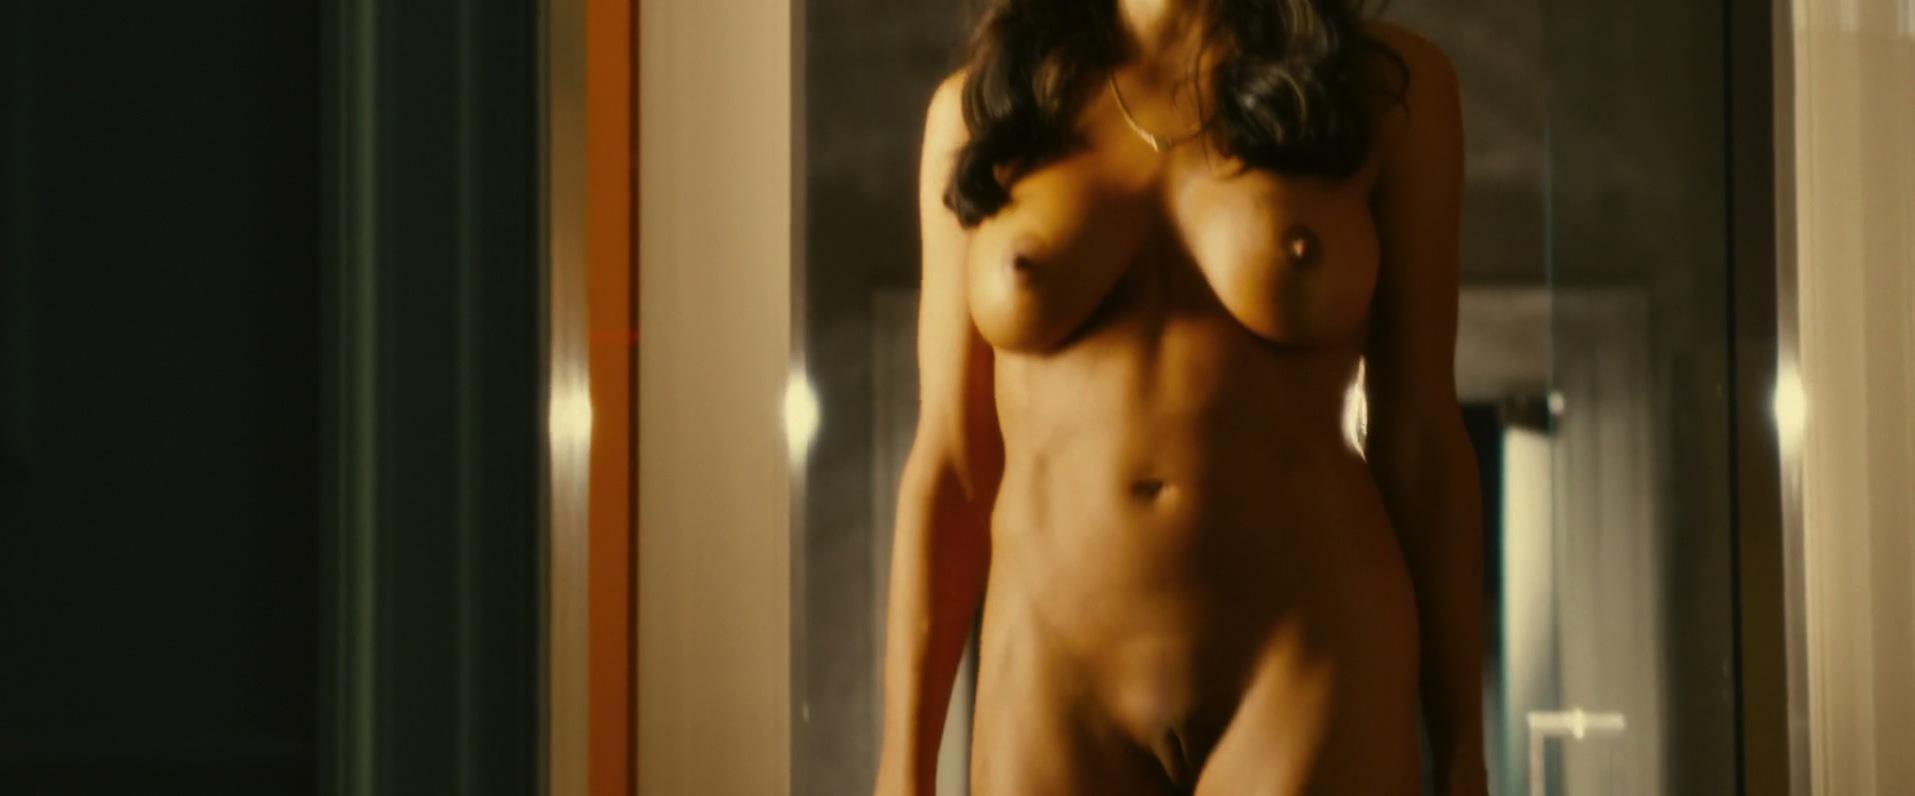 Gorgeous rosario dawson nude pics